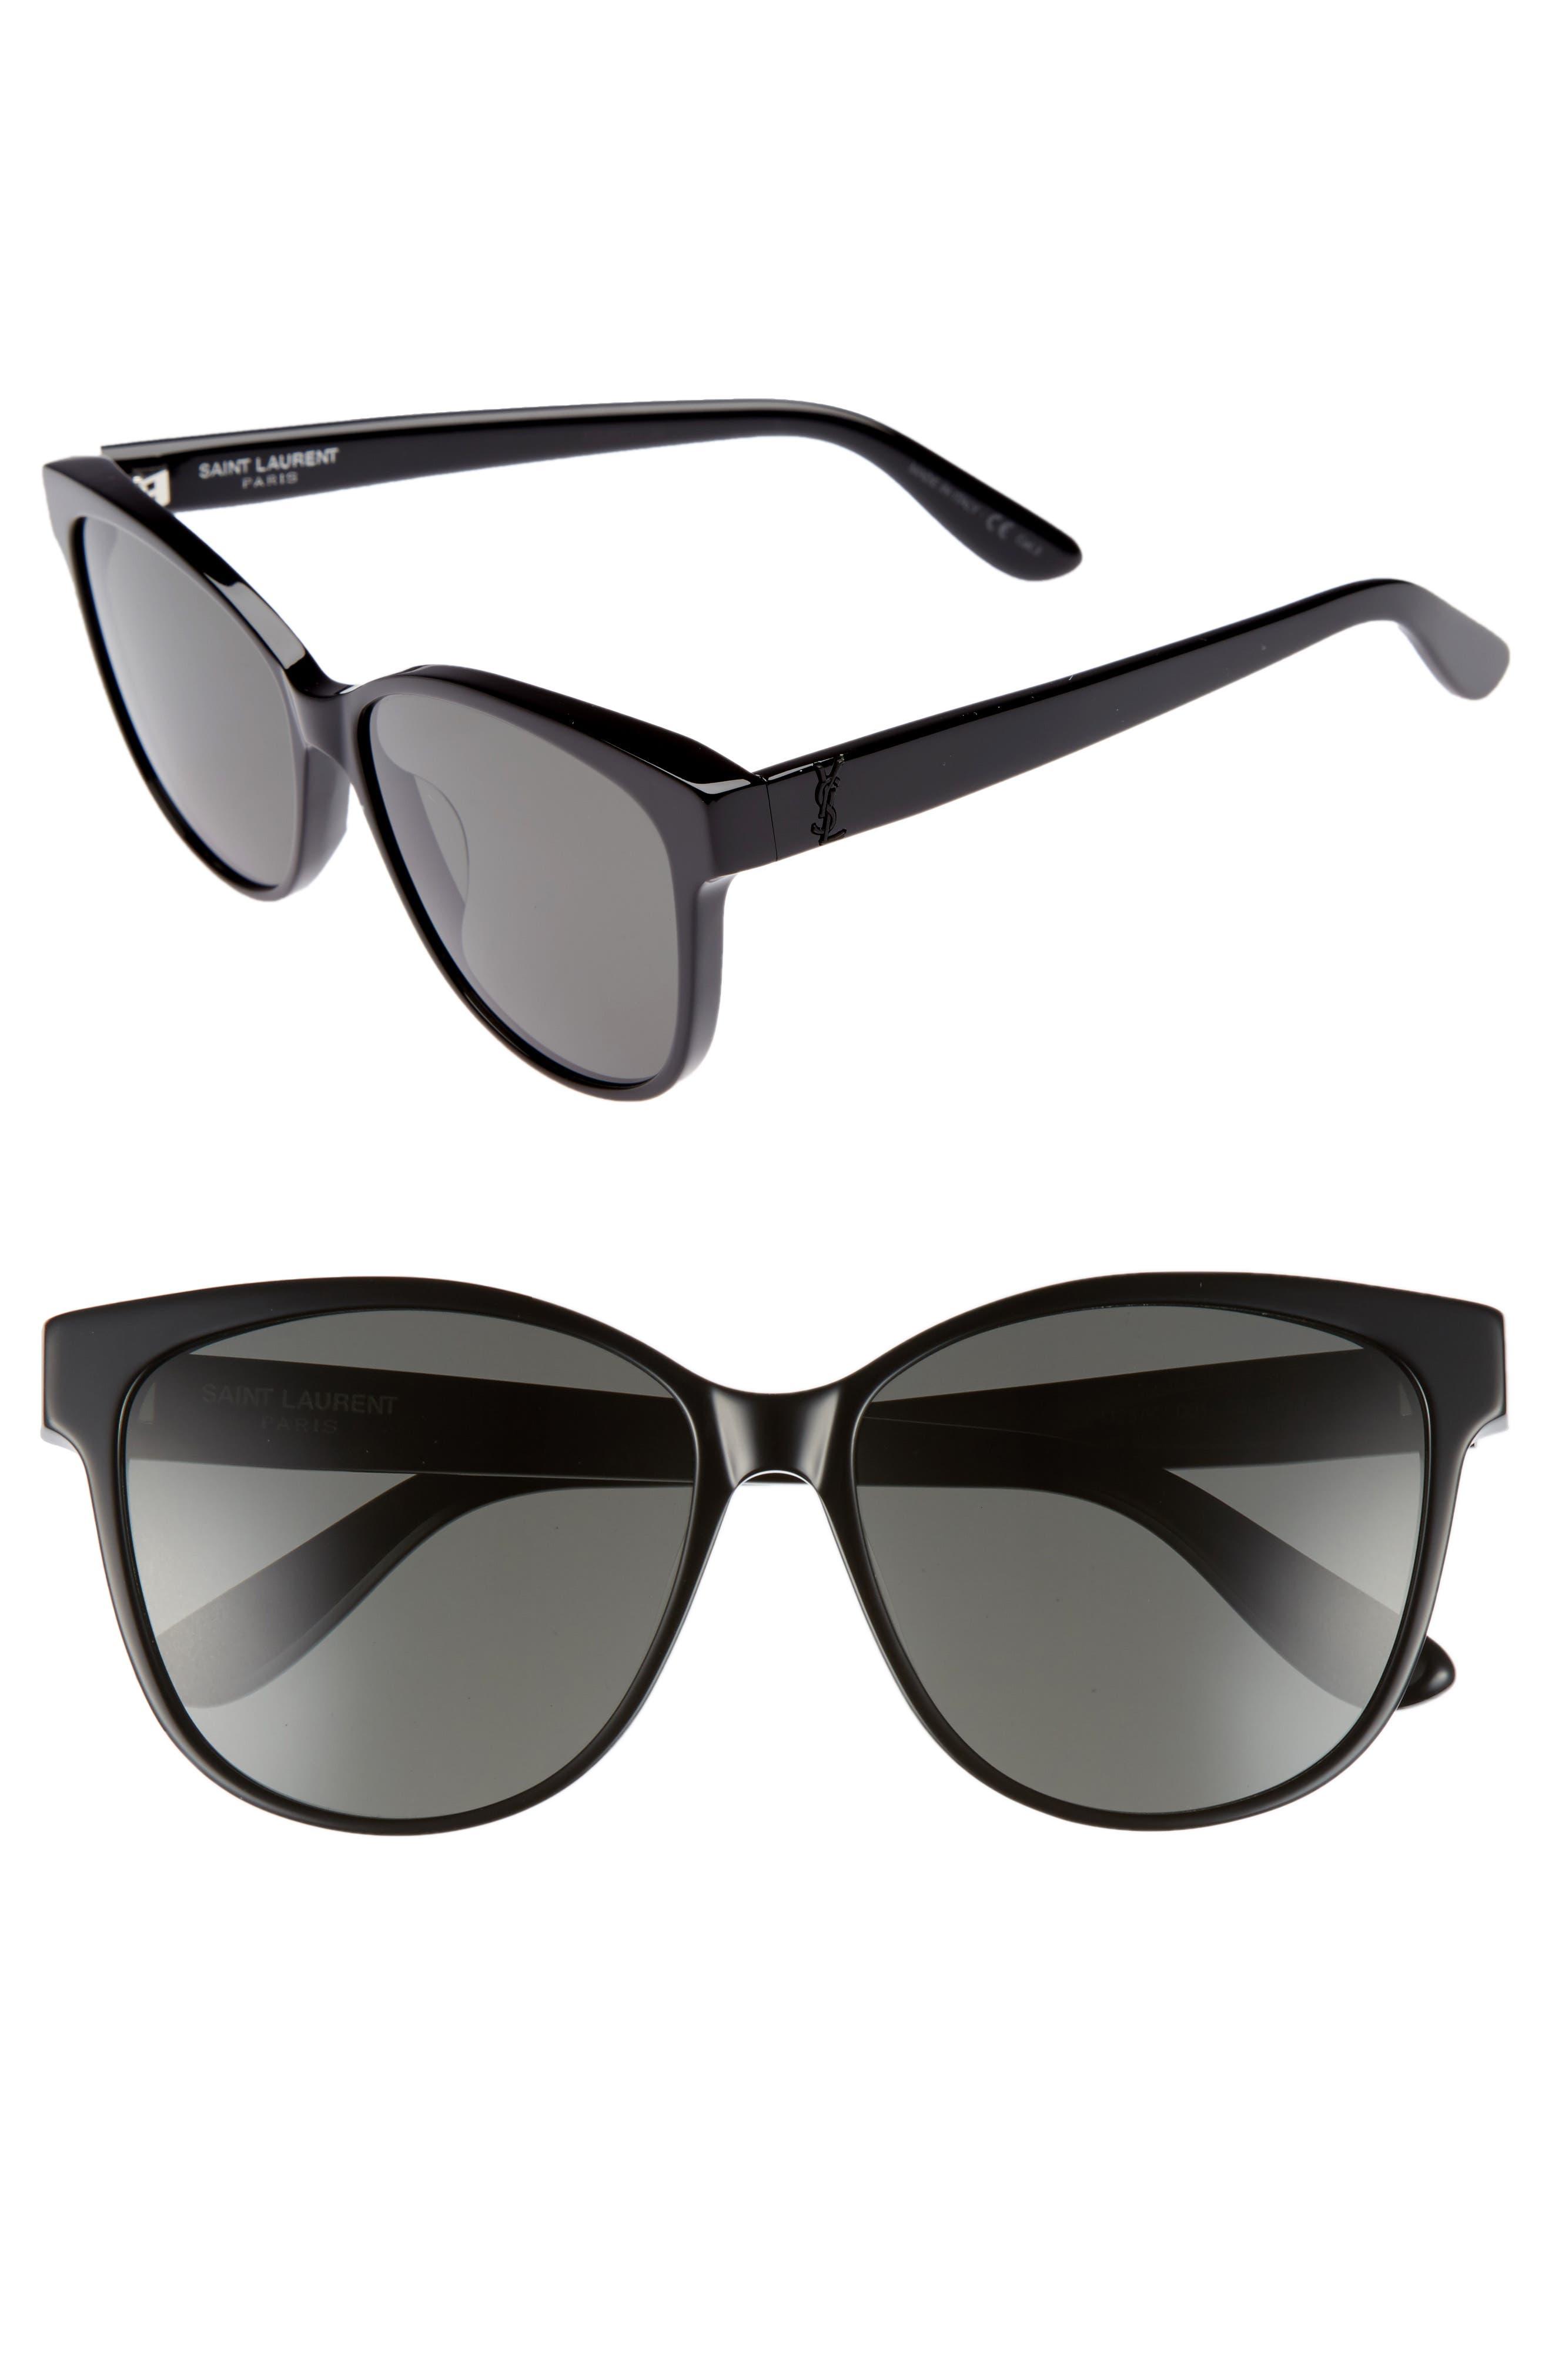 SAINT LAURENT, 58mm Cat Eye Sunglasses, Main thumbnail 1, color, BLACK